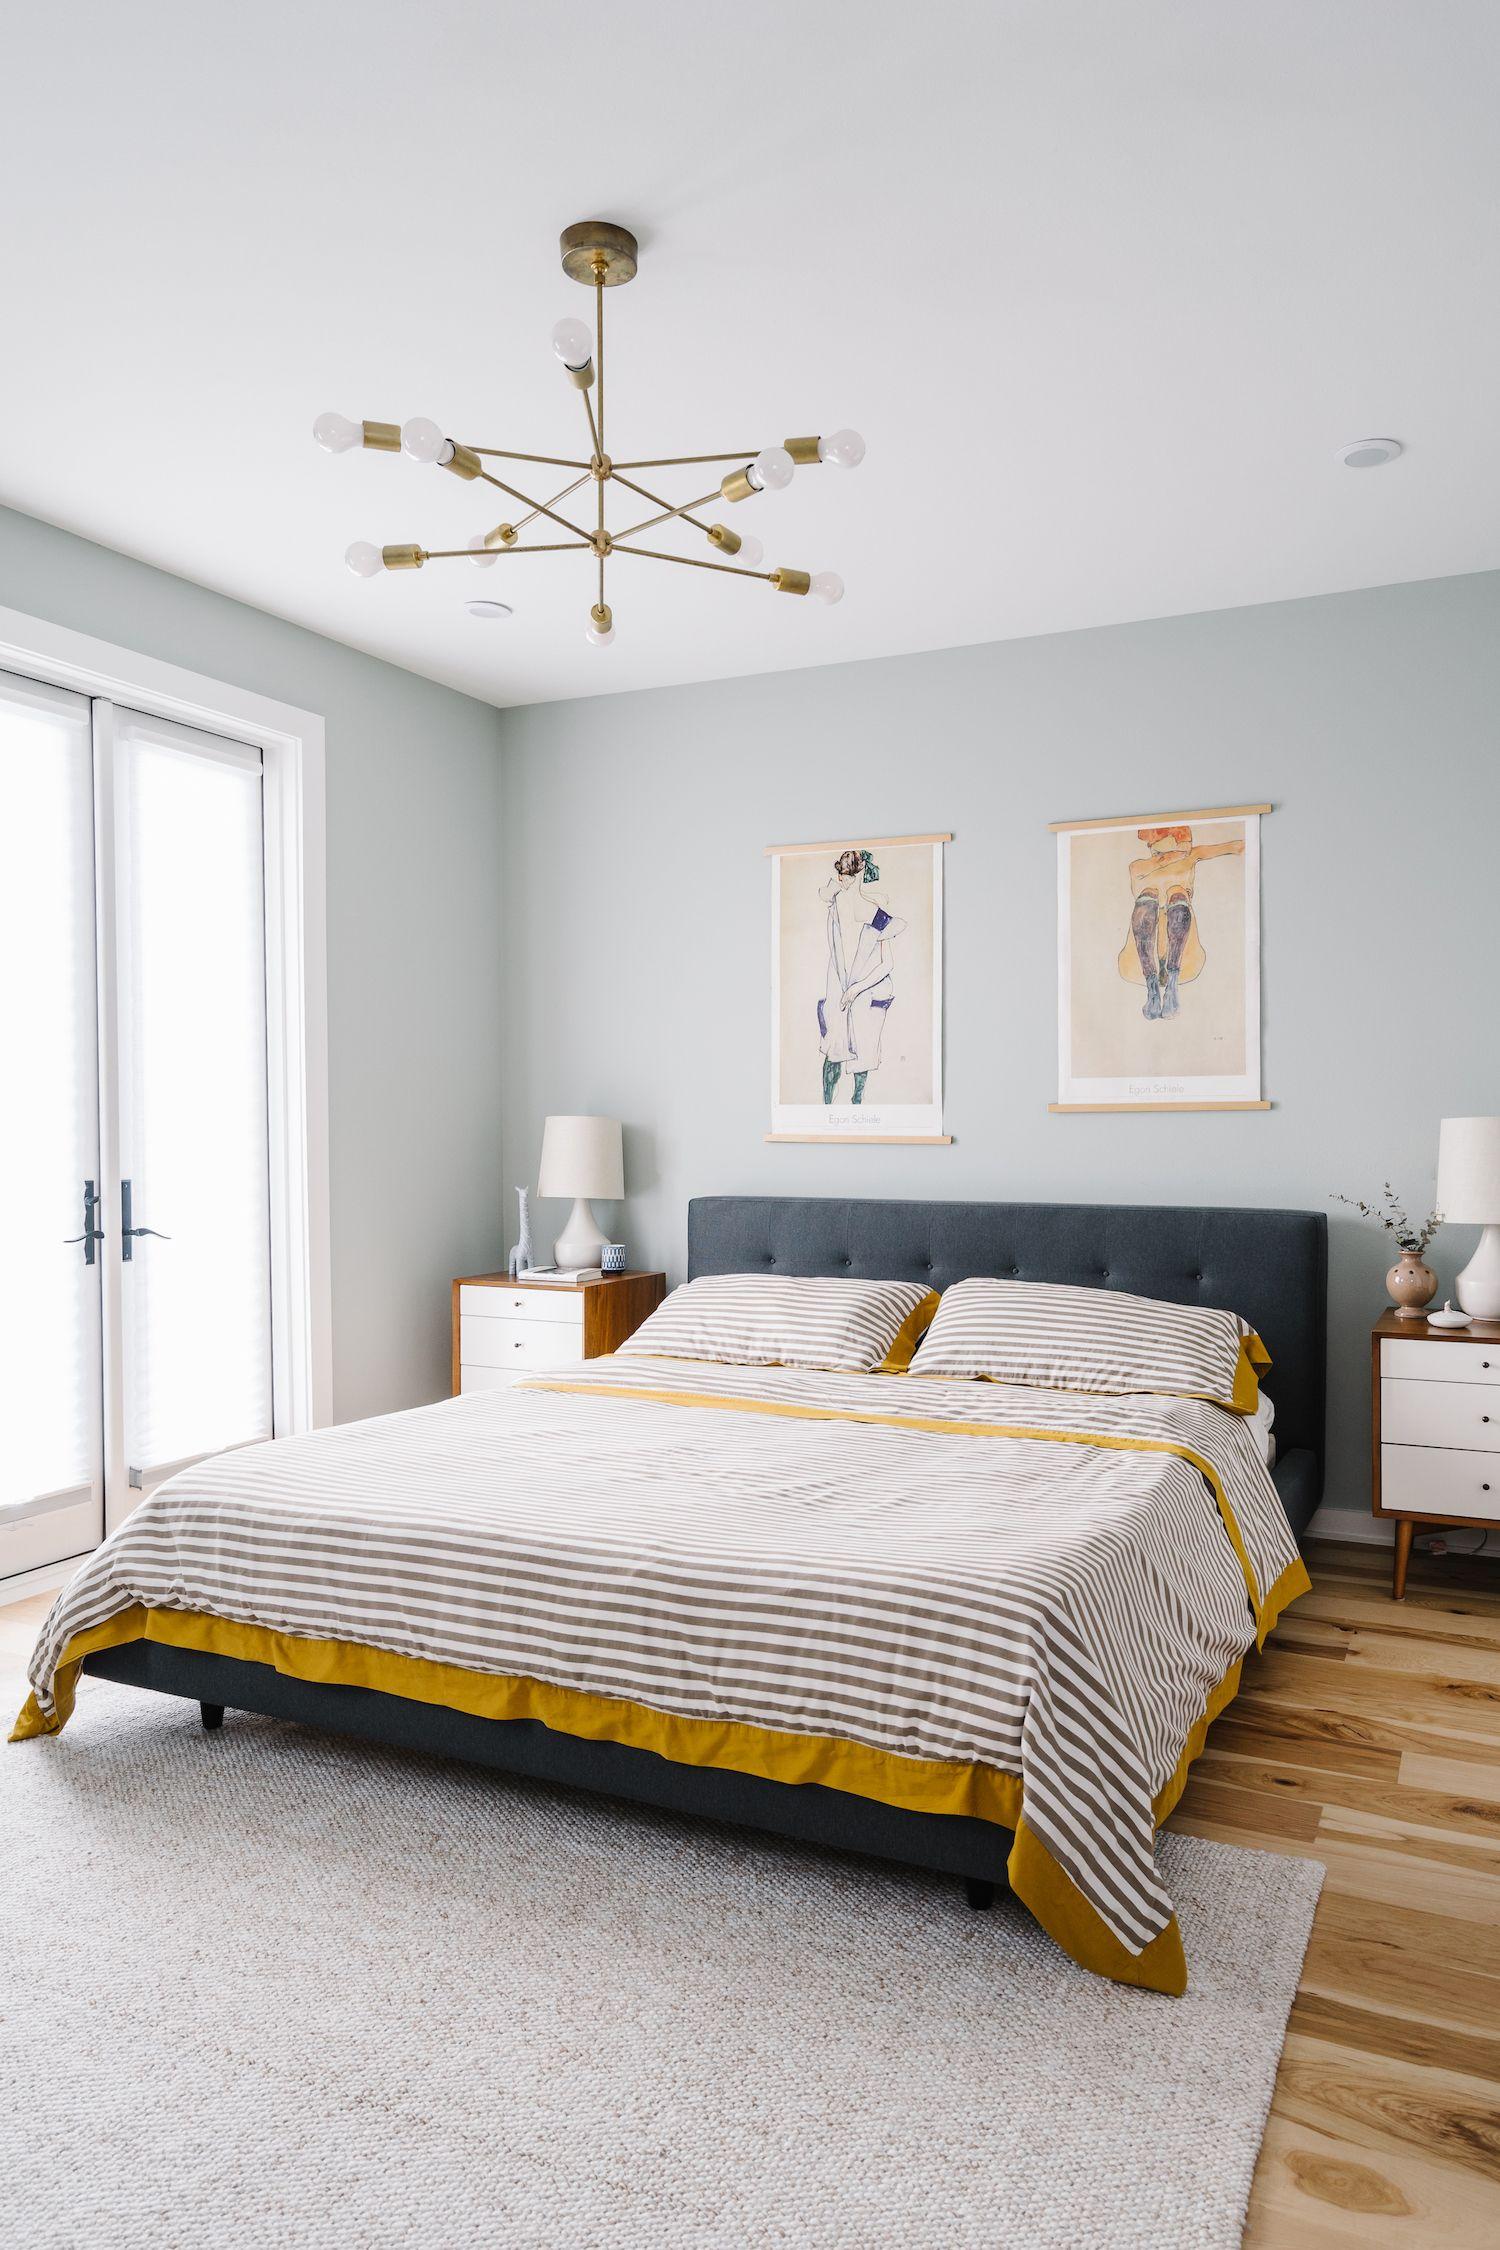 Maia Modern Bedroom Set: Home Decor Bedroom